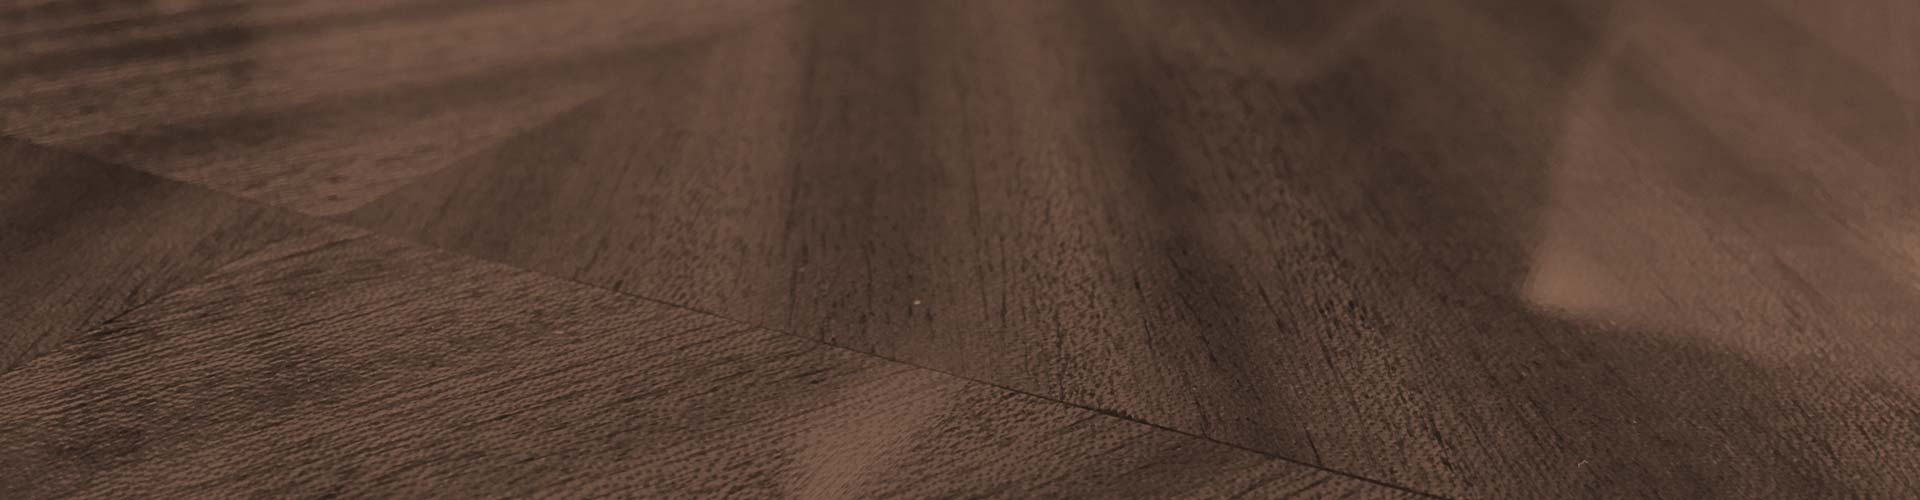 stevens-furniture-london-french-polishing-section-header-background-image